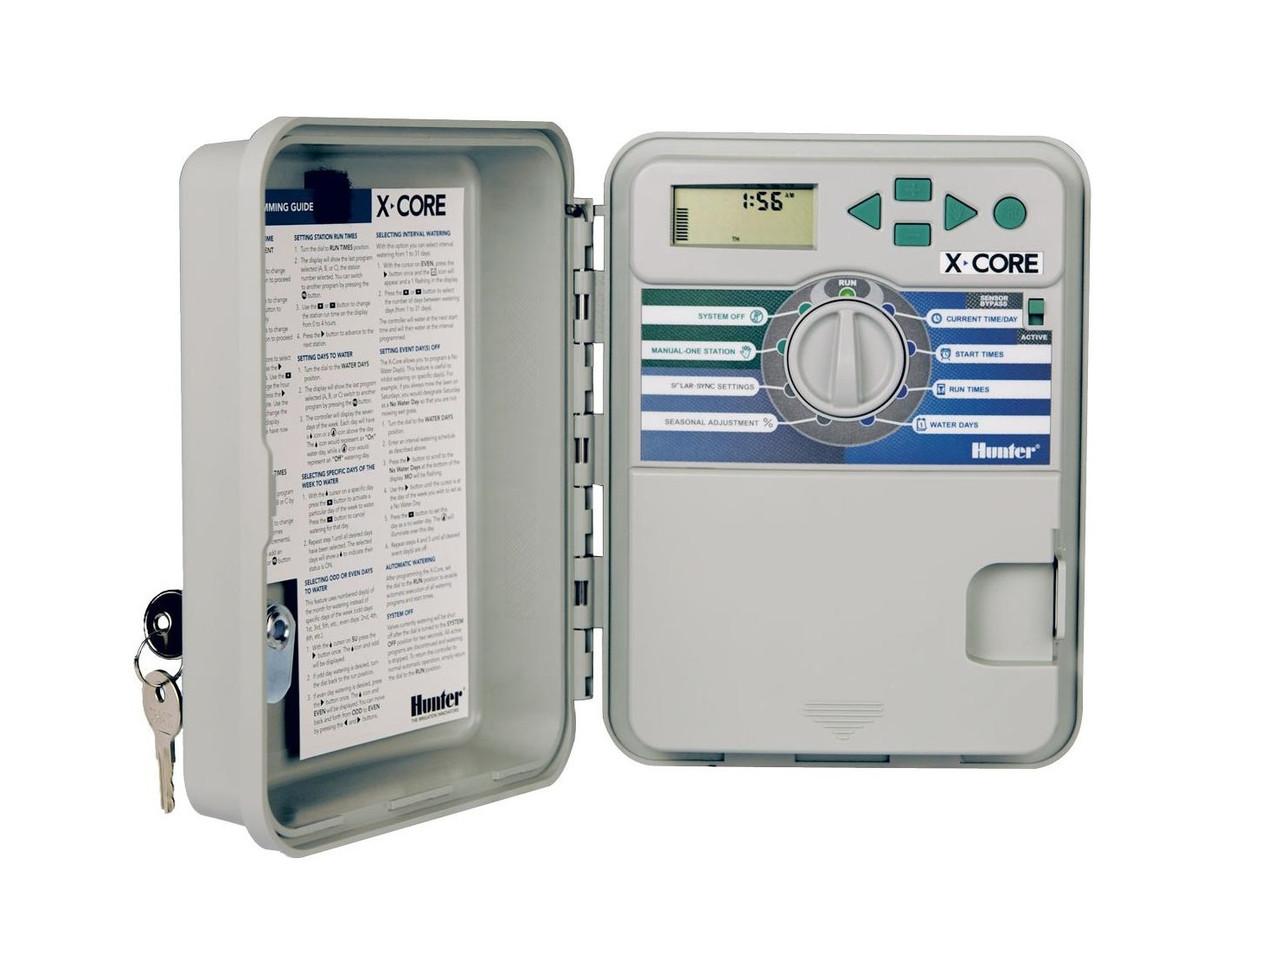 Контроллер X-CORE XC-601-E на 6 зон для наружной установки с трансформатором П